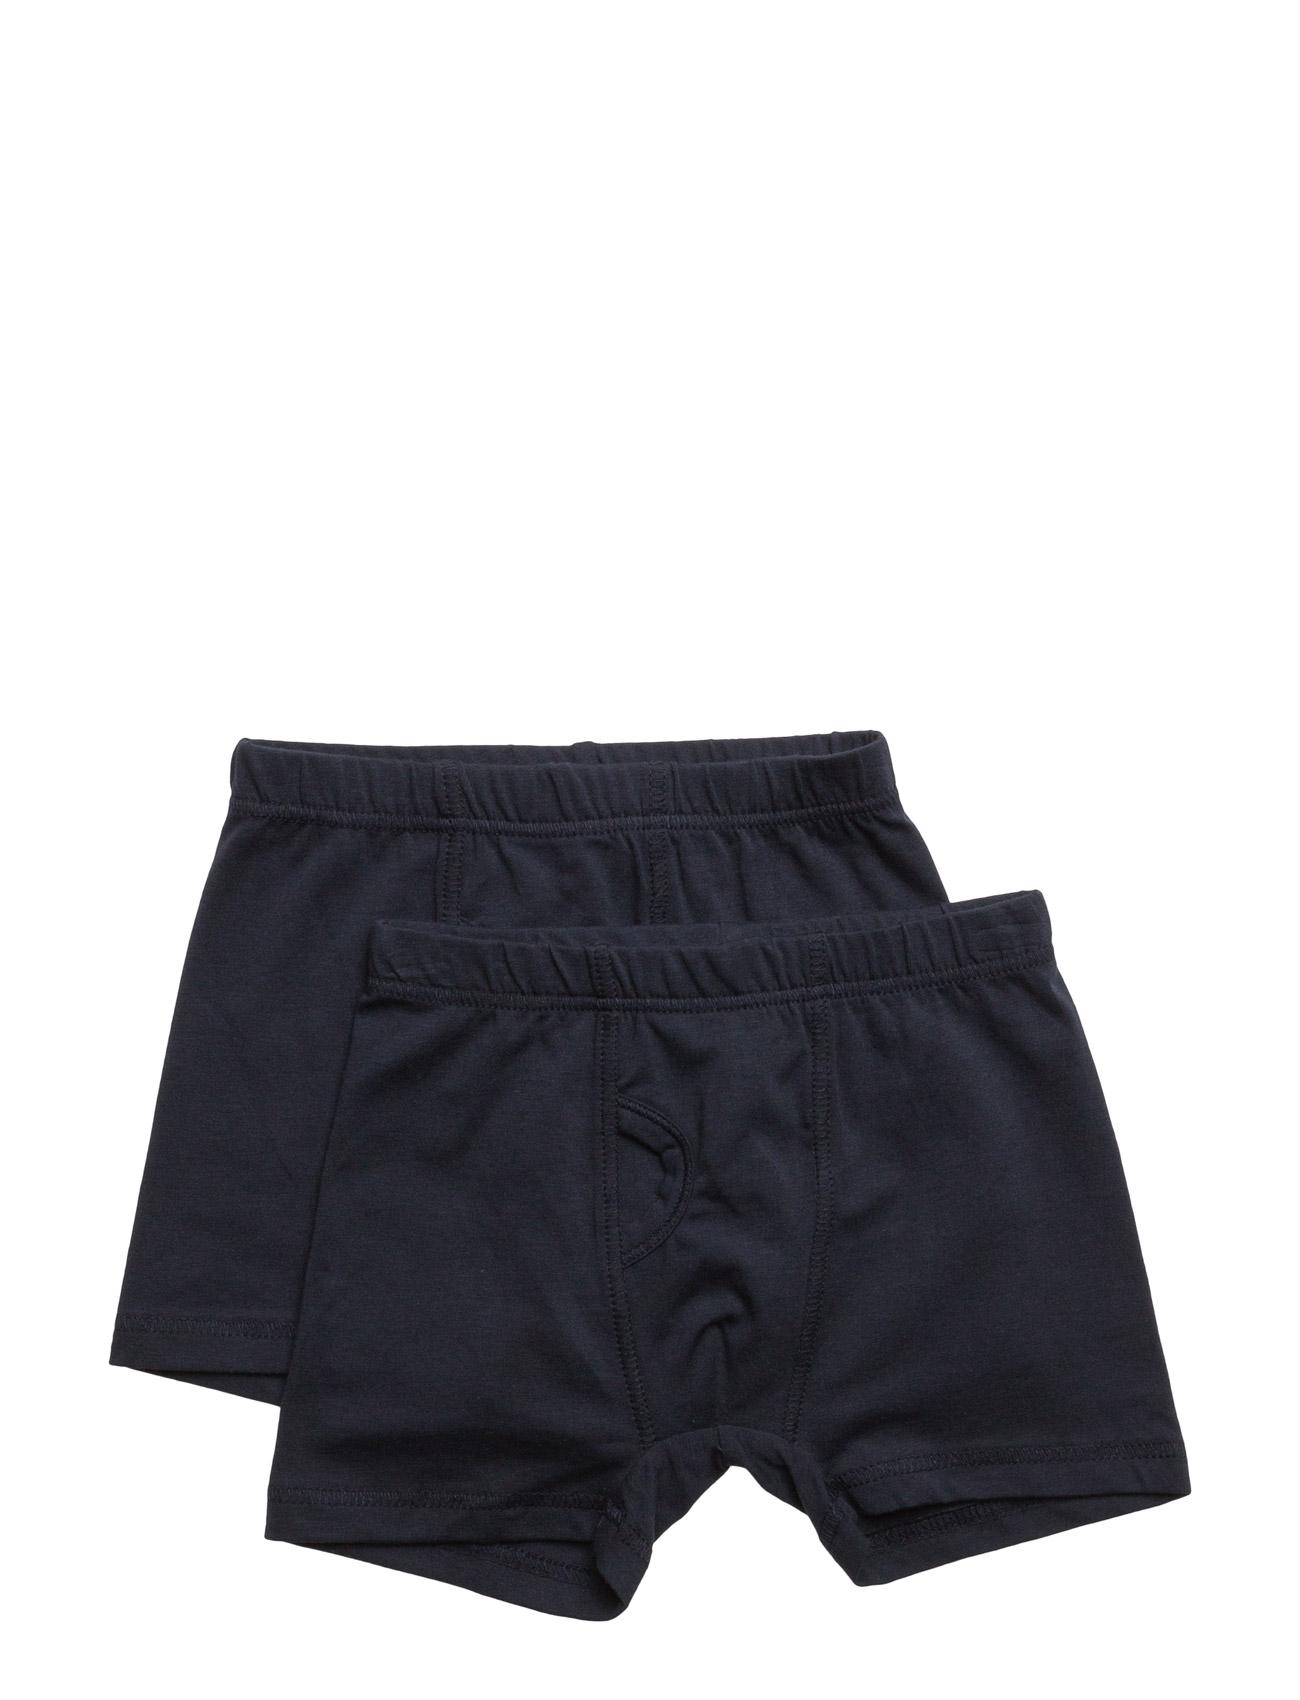 Cozy Me Underpants Boy Müsli by Green Cotton Undertøj til Børn i Navy blå